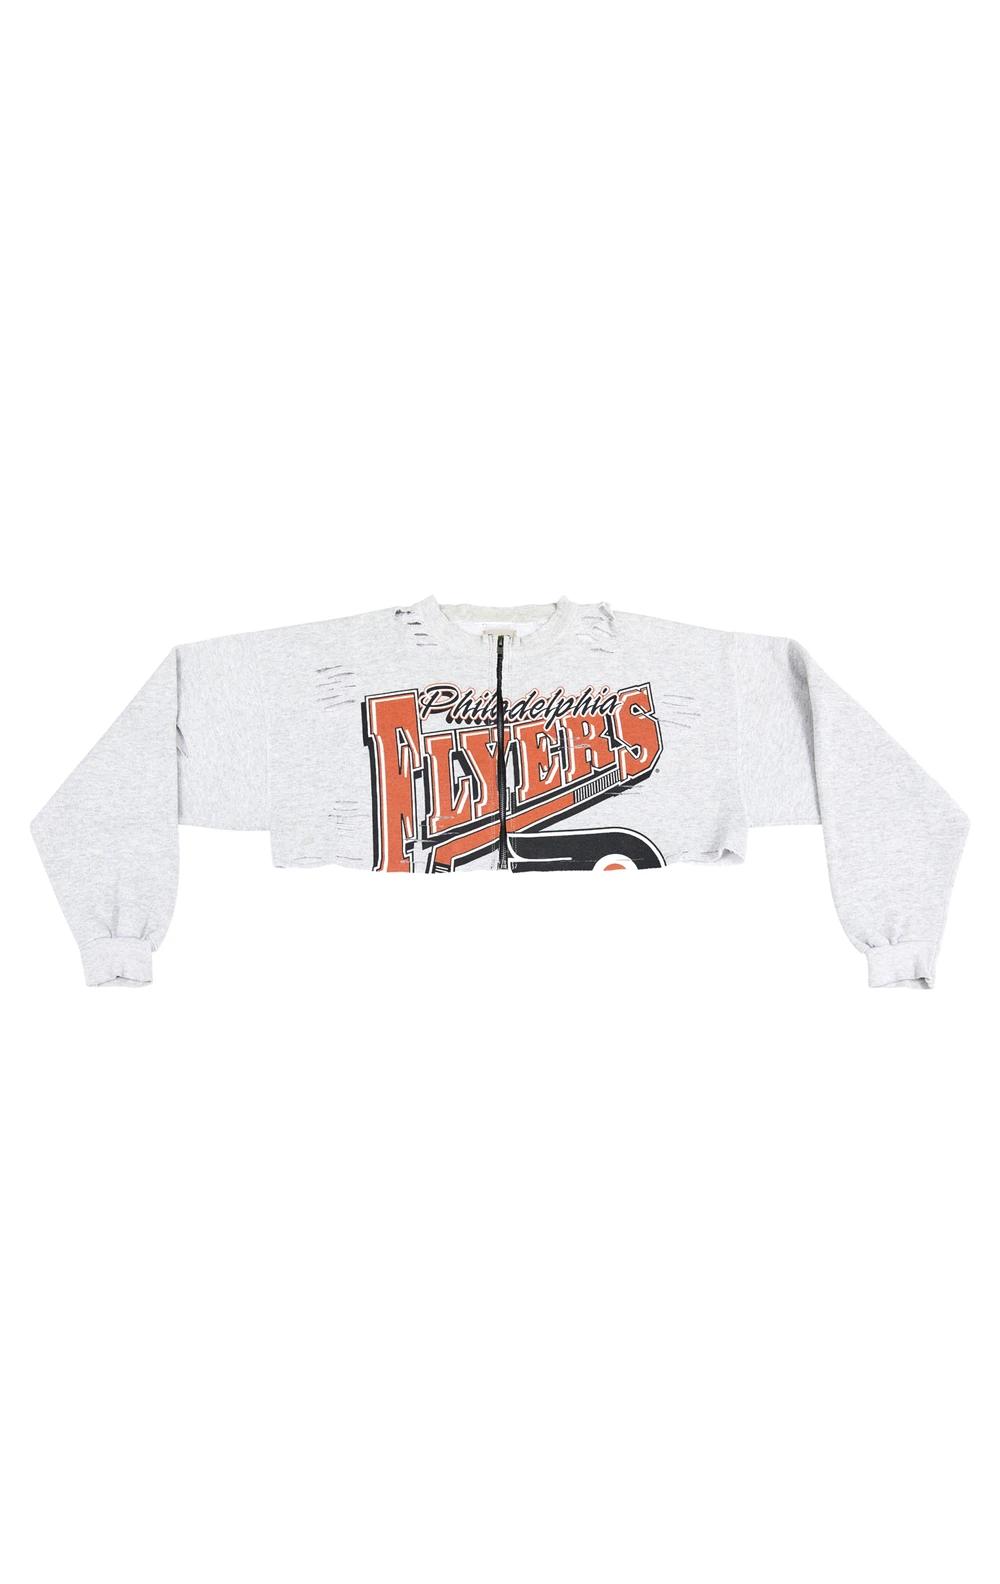 Vintage Zip Front Sports Sweatshirt Sports Sweatshirts Sweatshirts College Sweatshirt